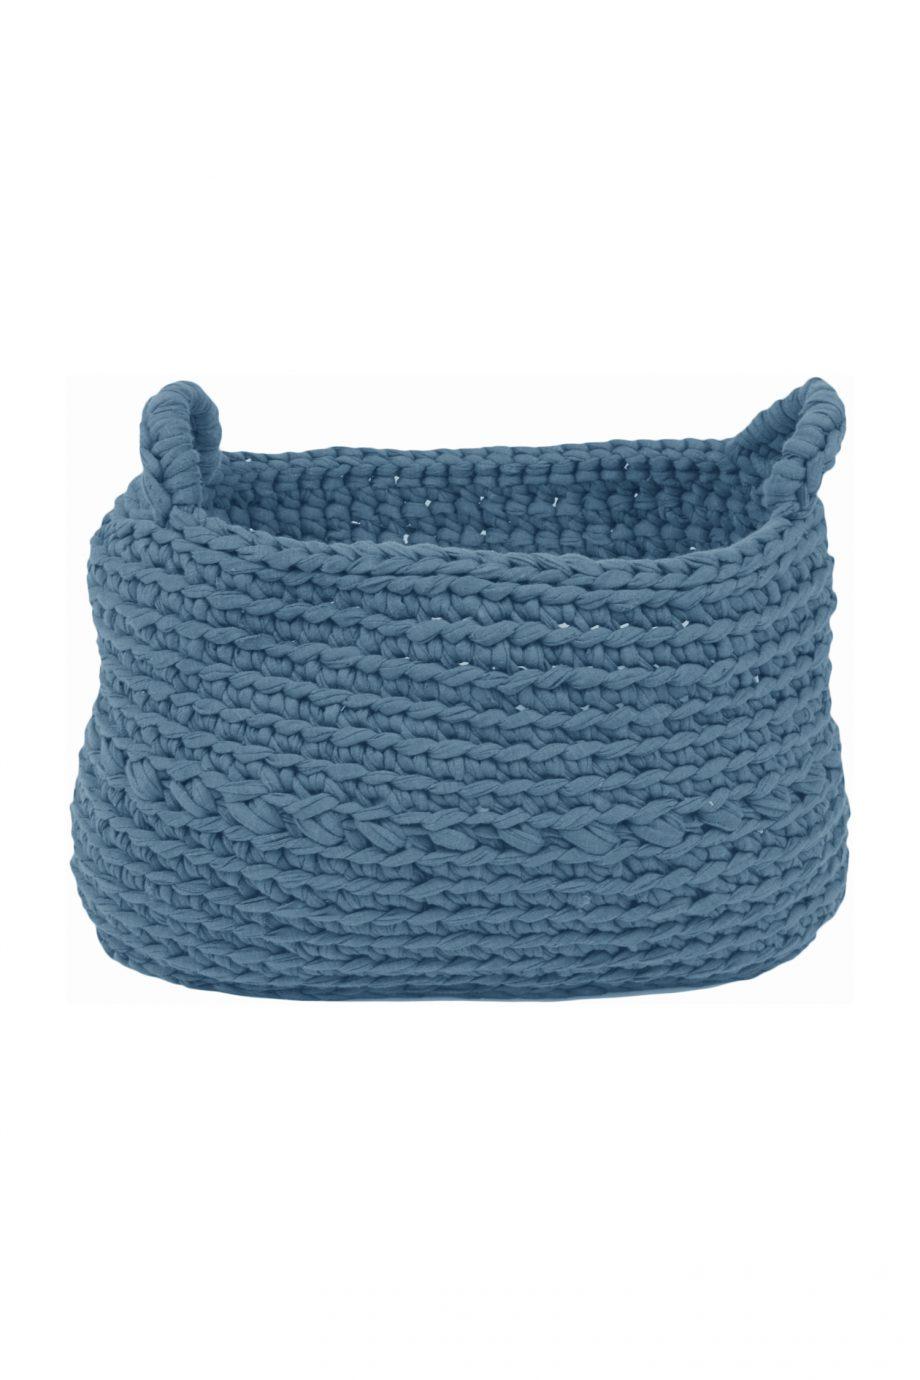 basic baby blauw gehaakt katoenen mand xlarge